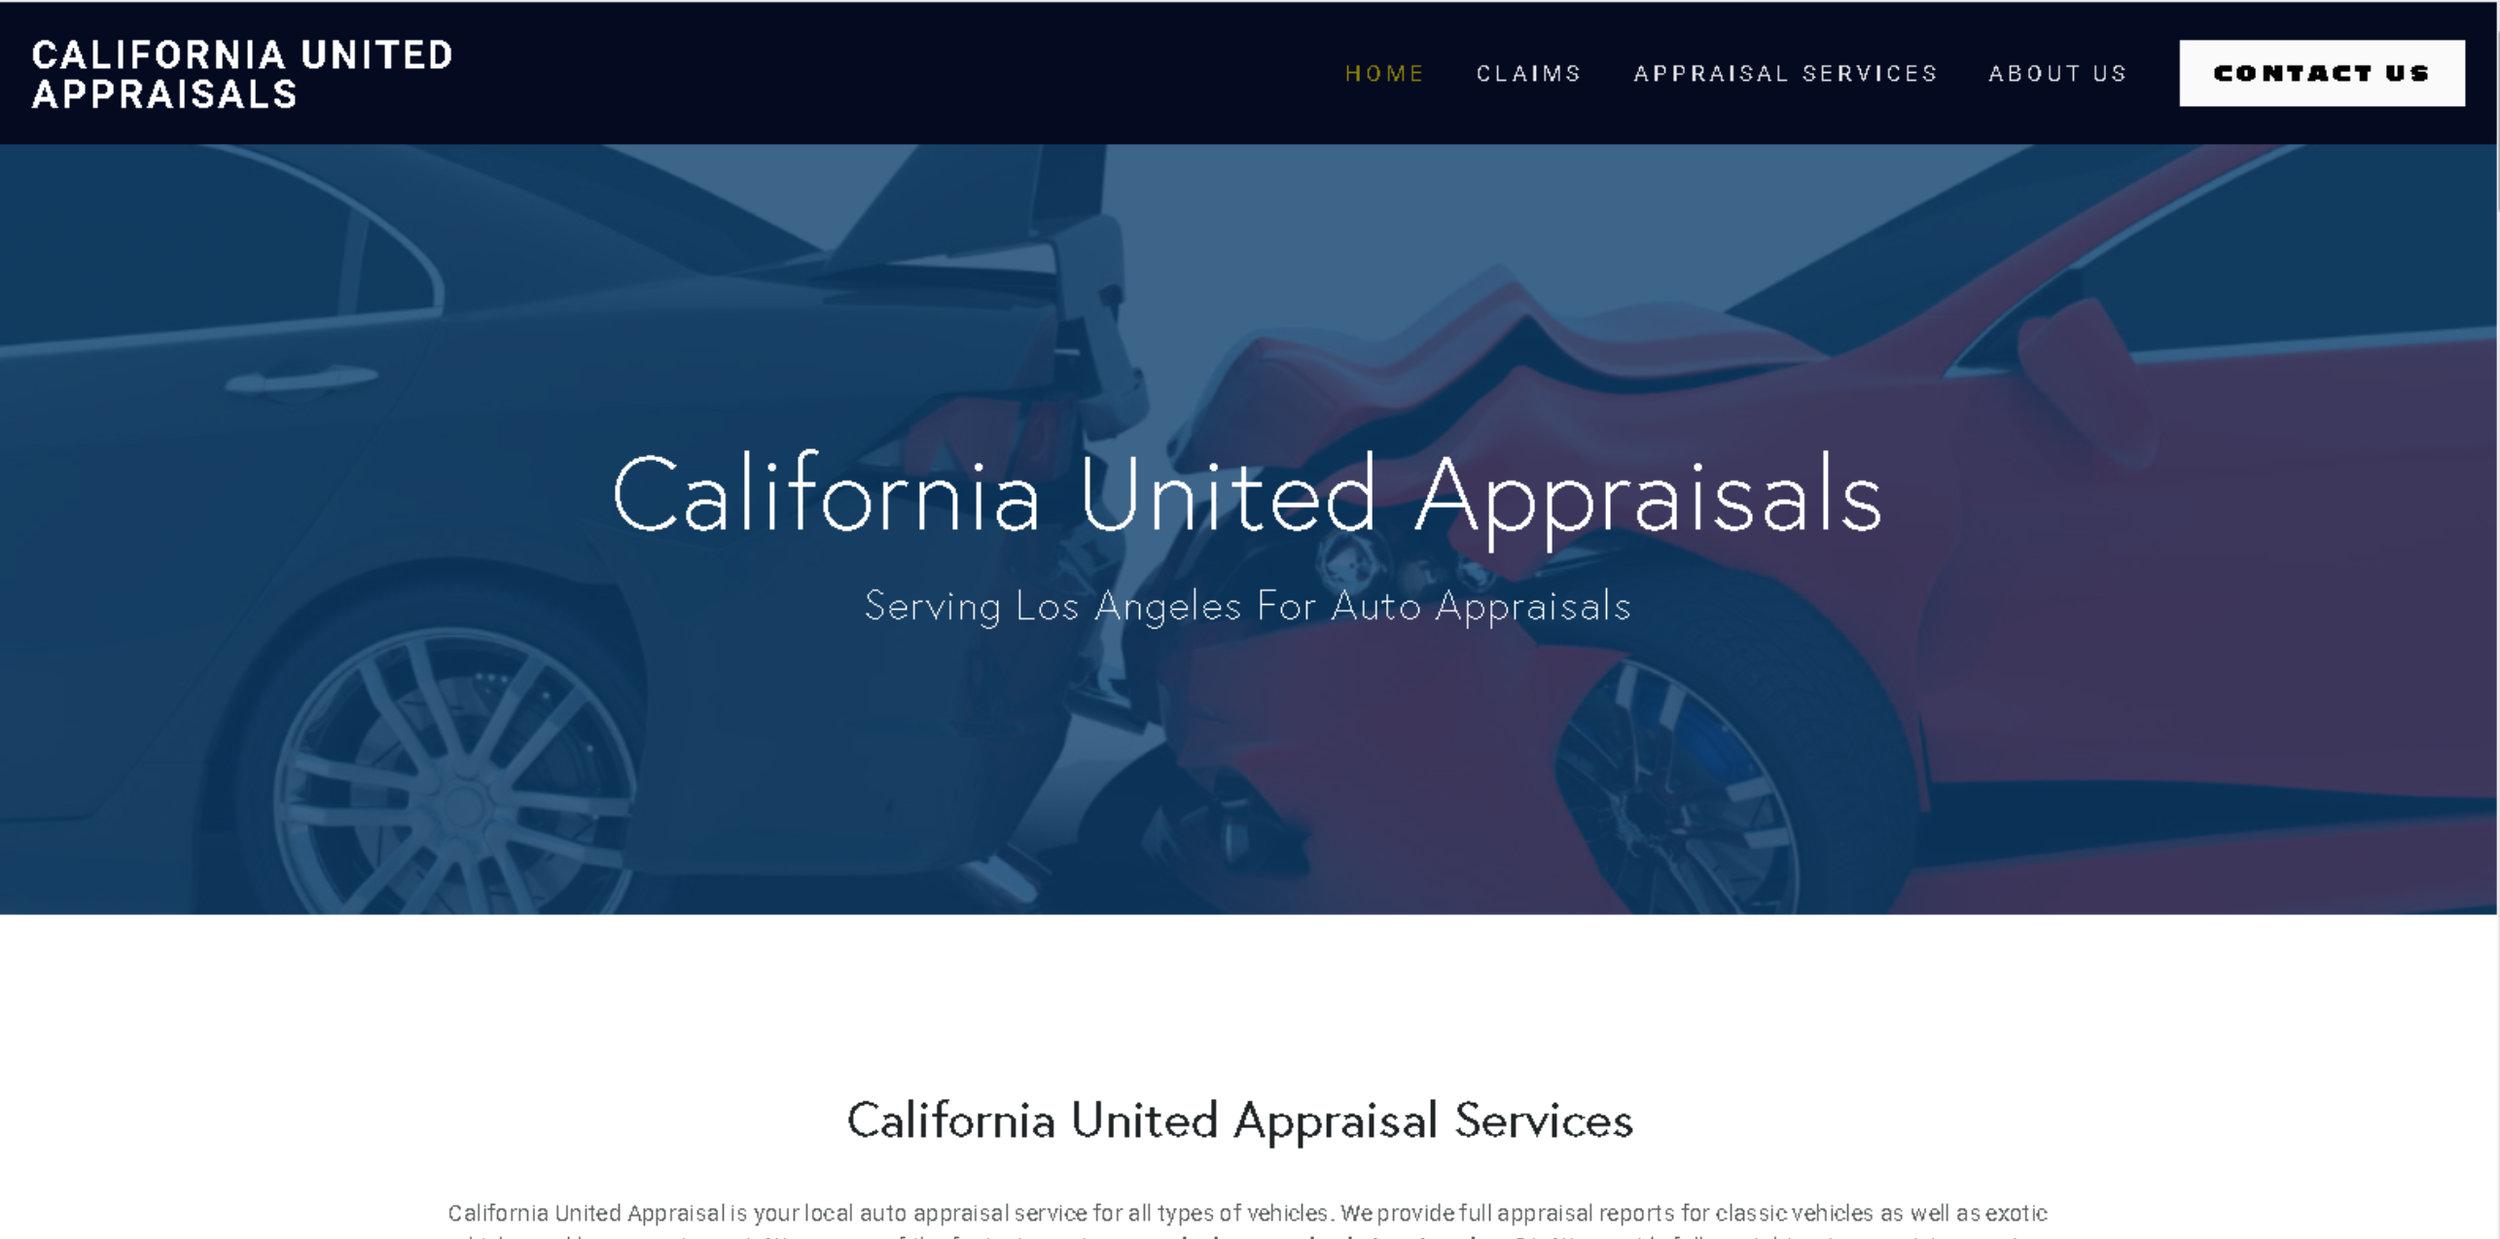 California United Appraisals - Website